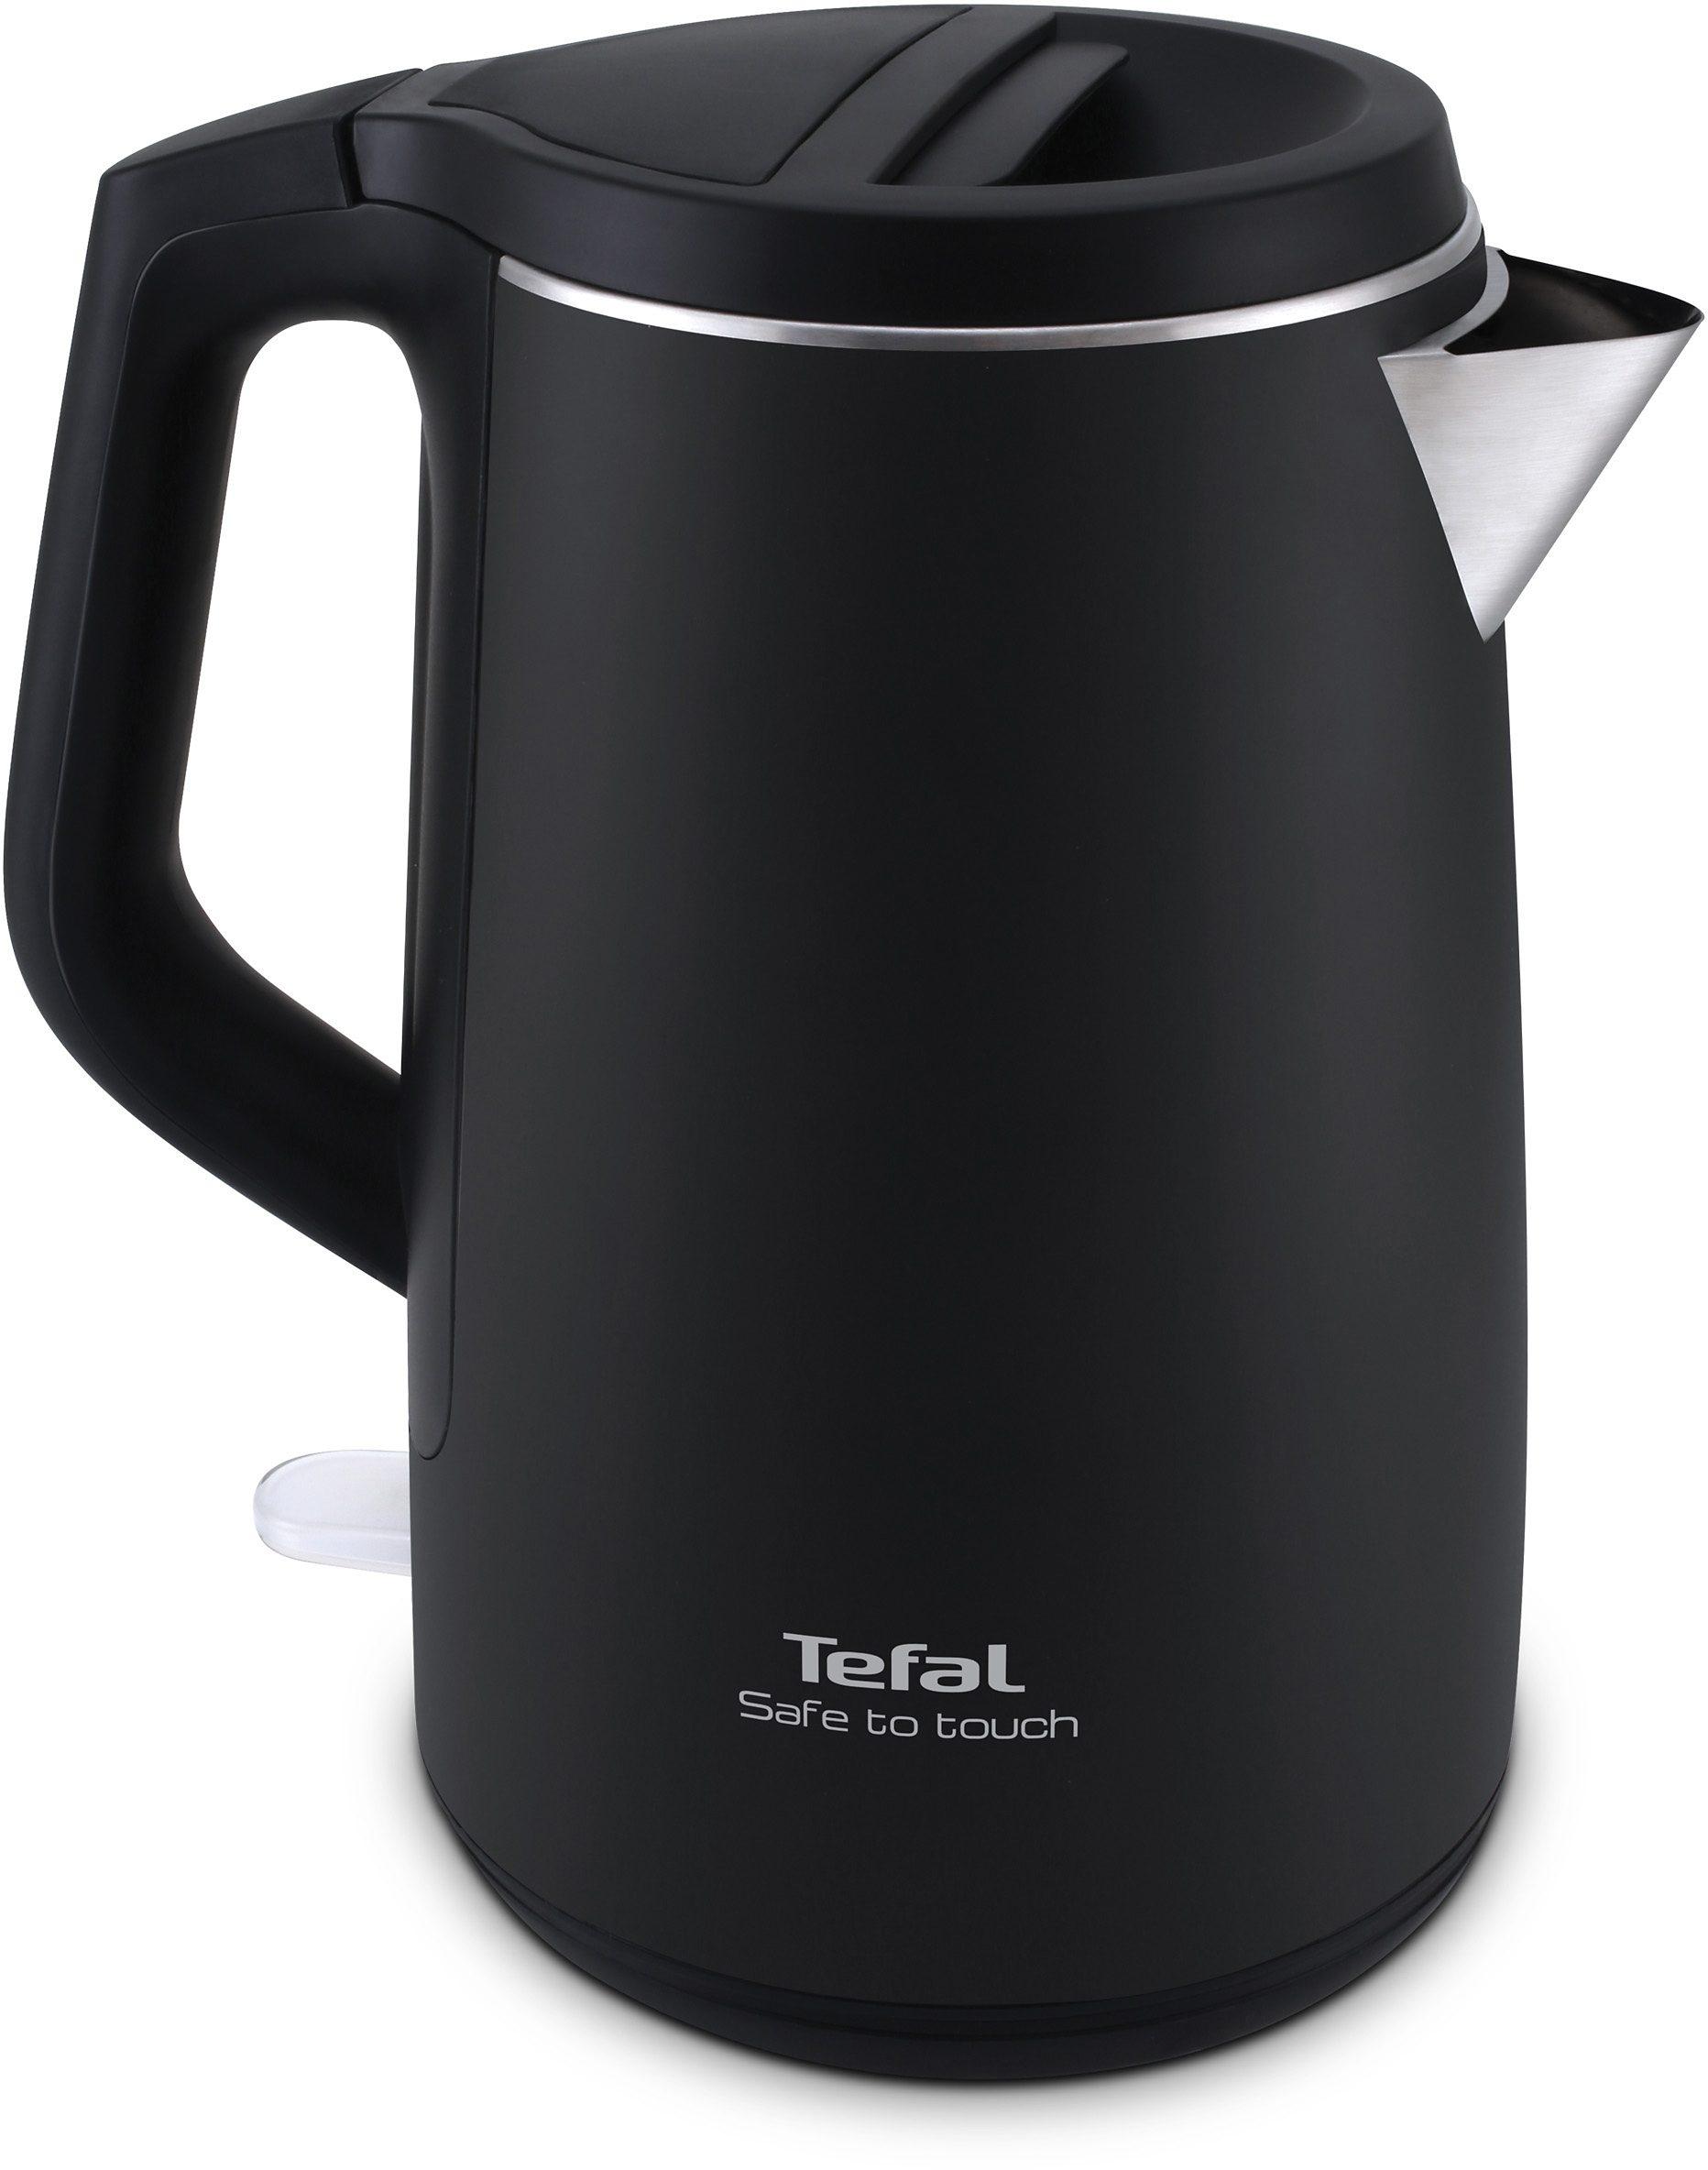 Tefal Wasserkocher KO3718, für 1,5 Liter, 2400 Watt